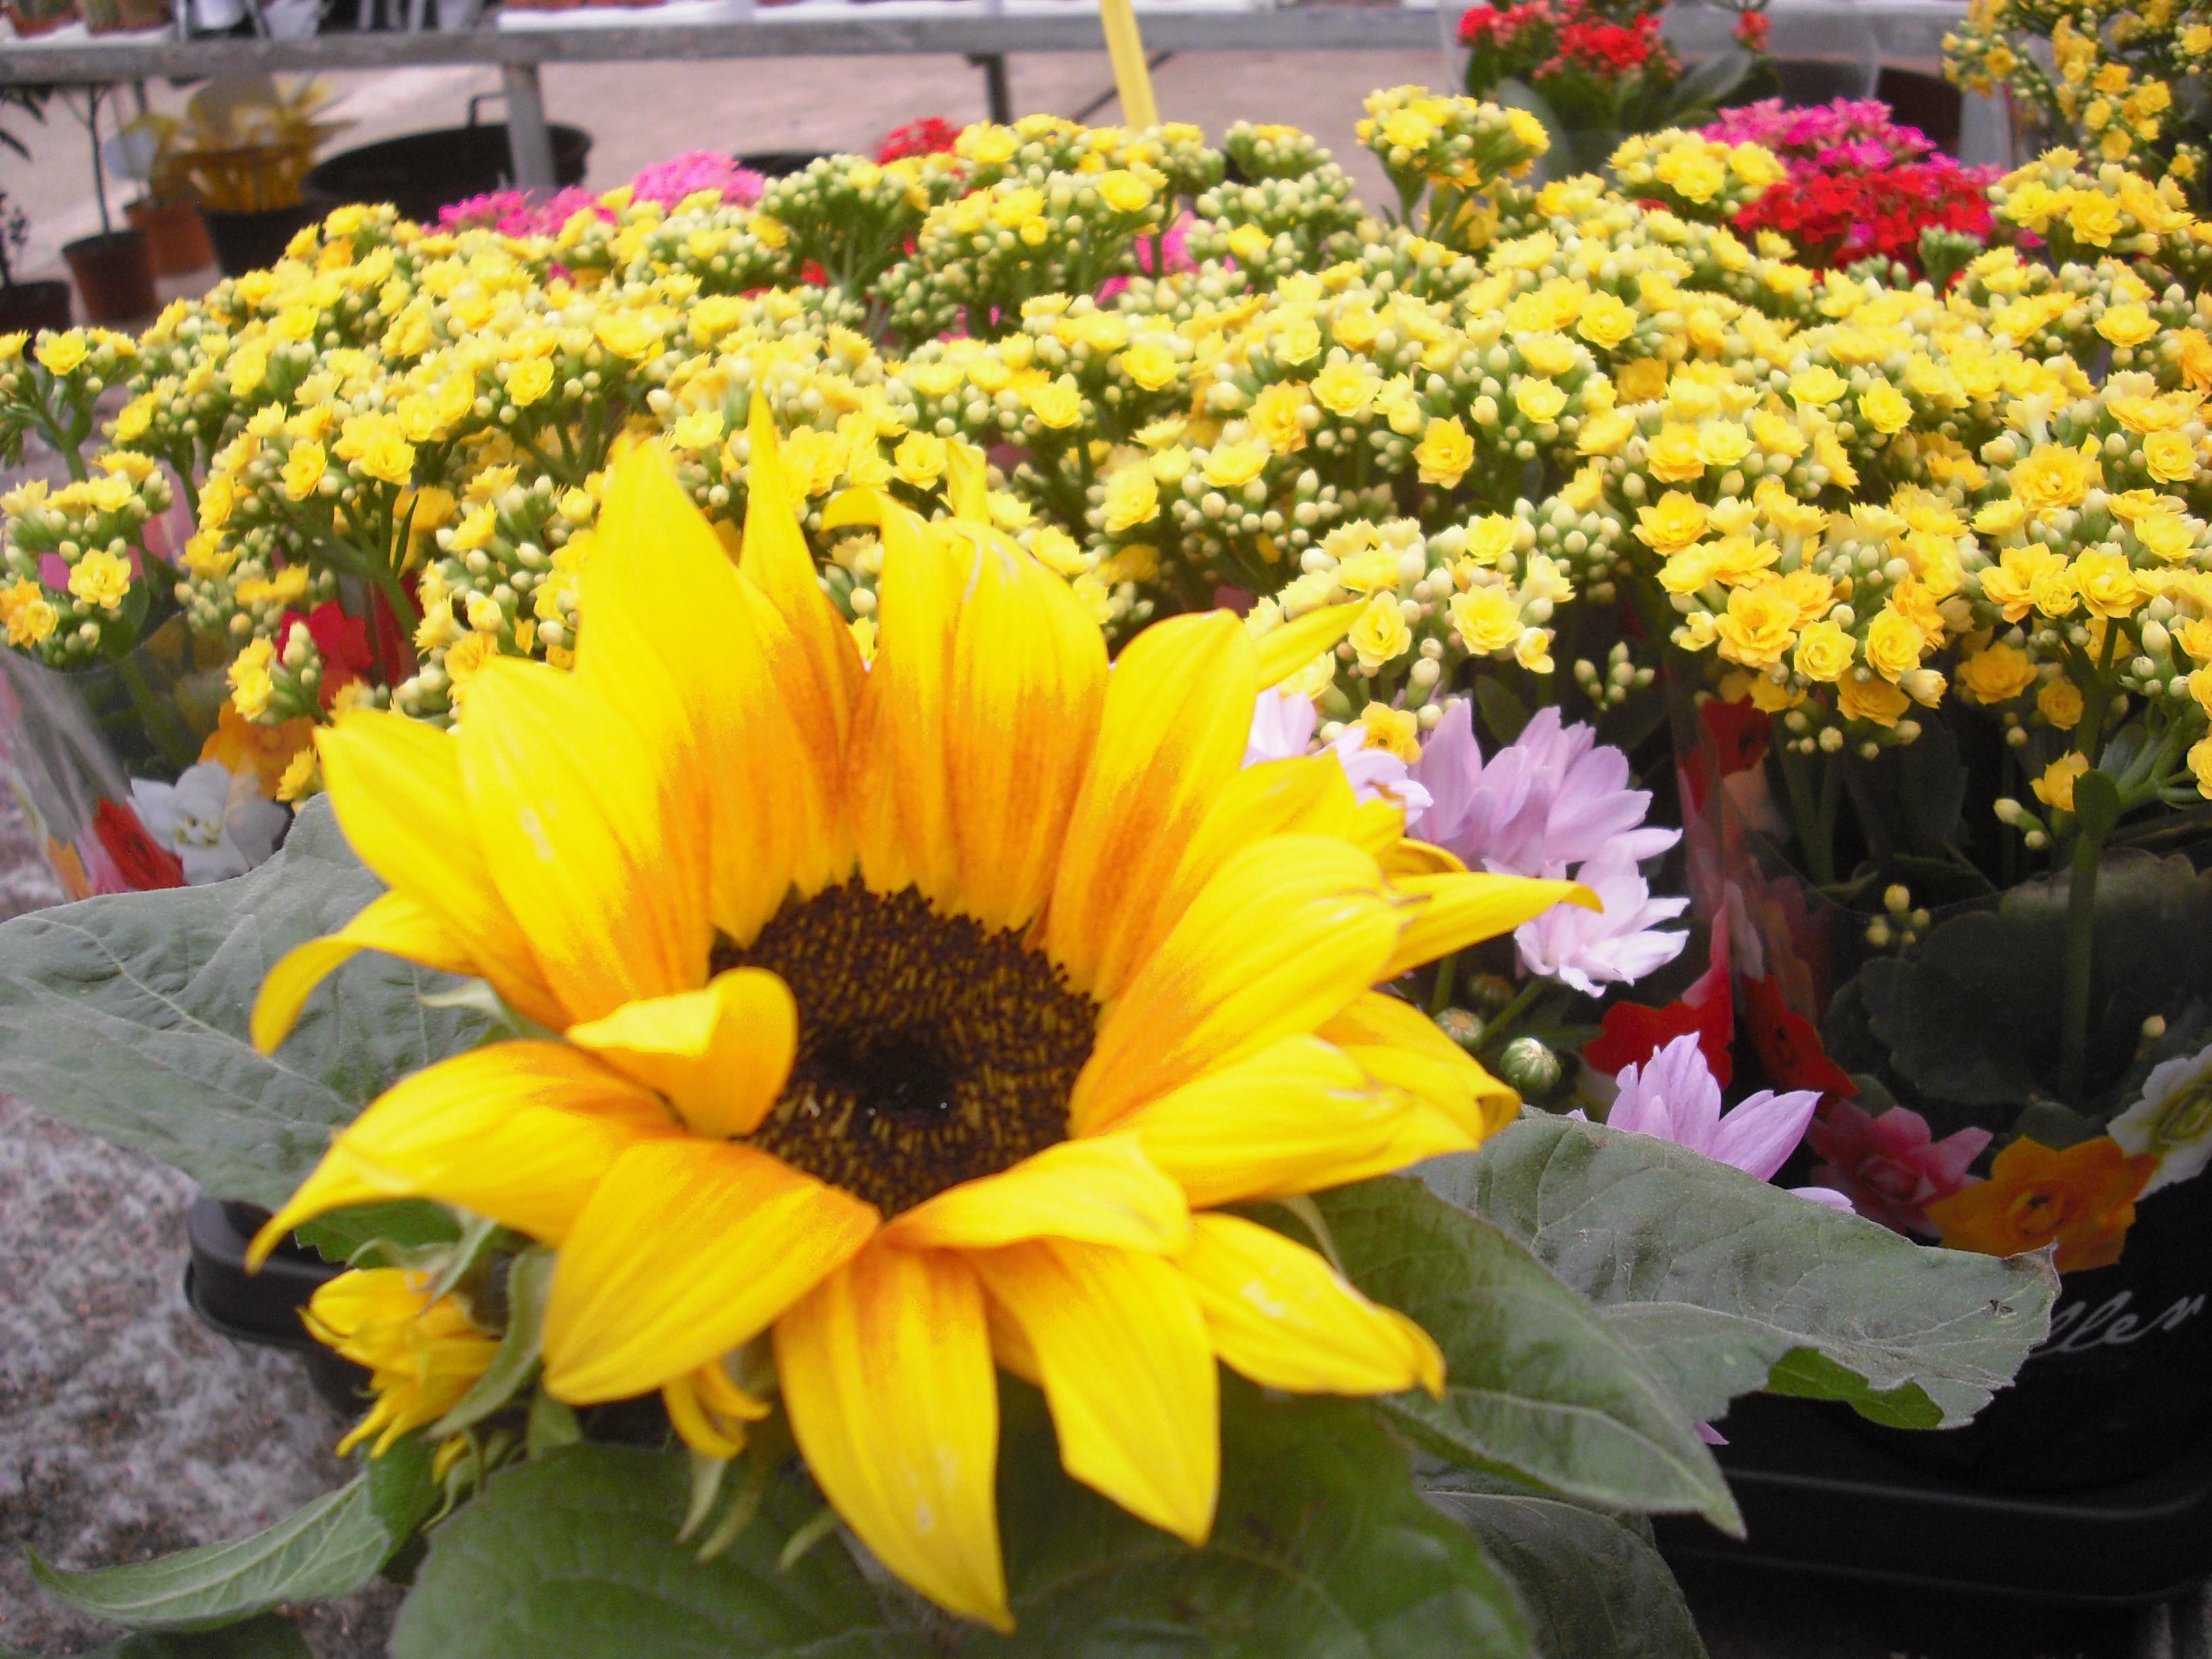 flores-maio-2013-219.JPG